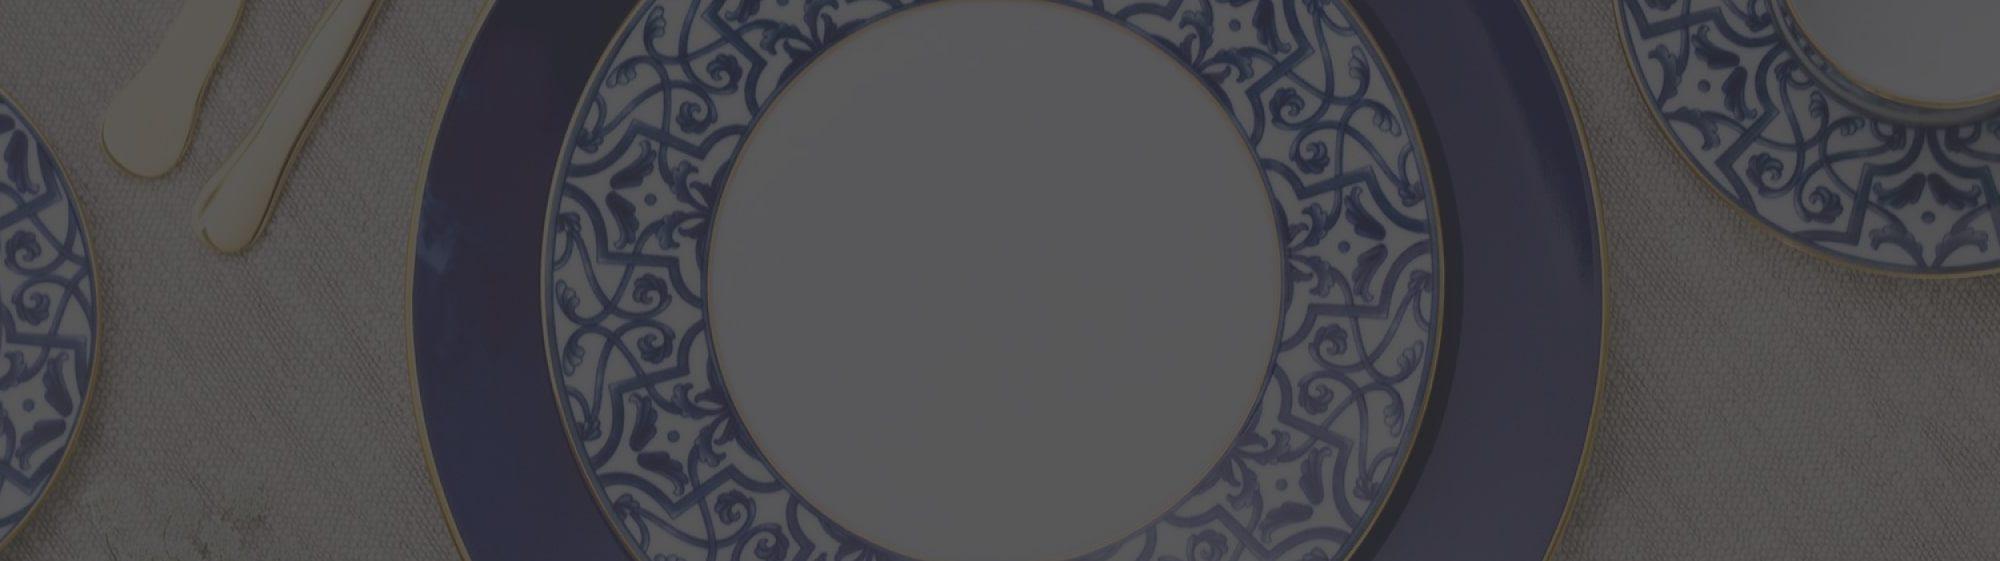 usercase-lotharjohn-heading-min